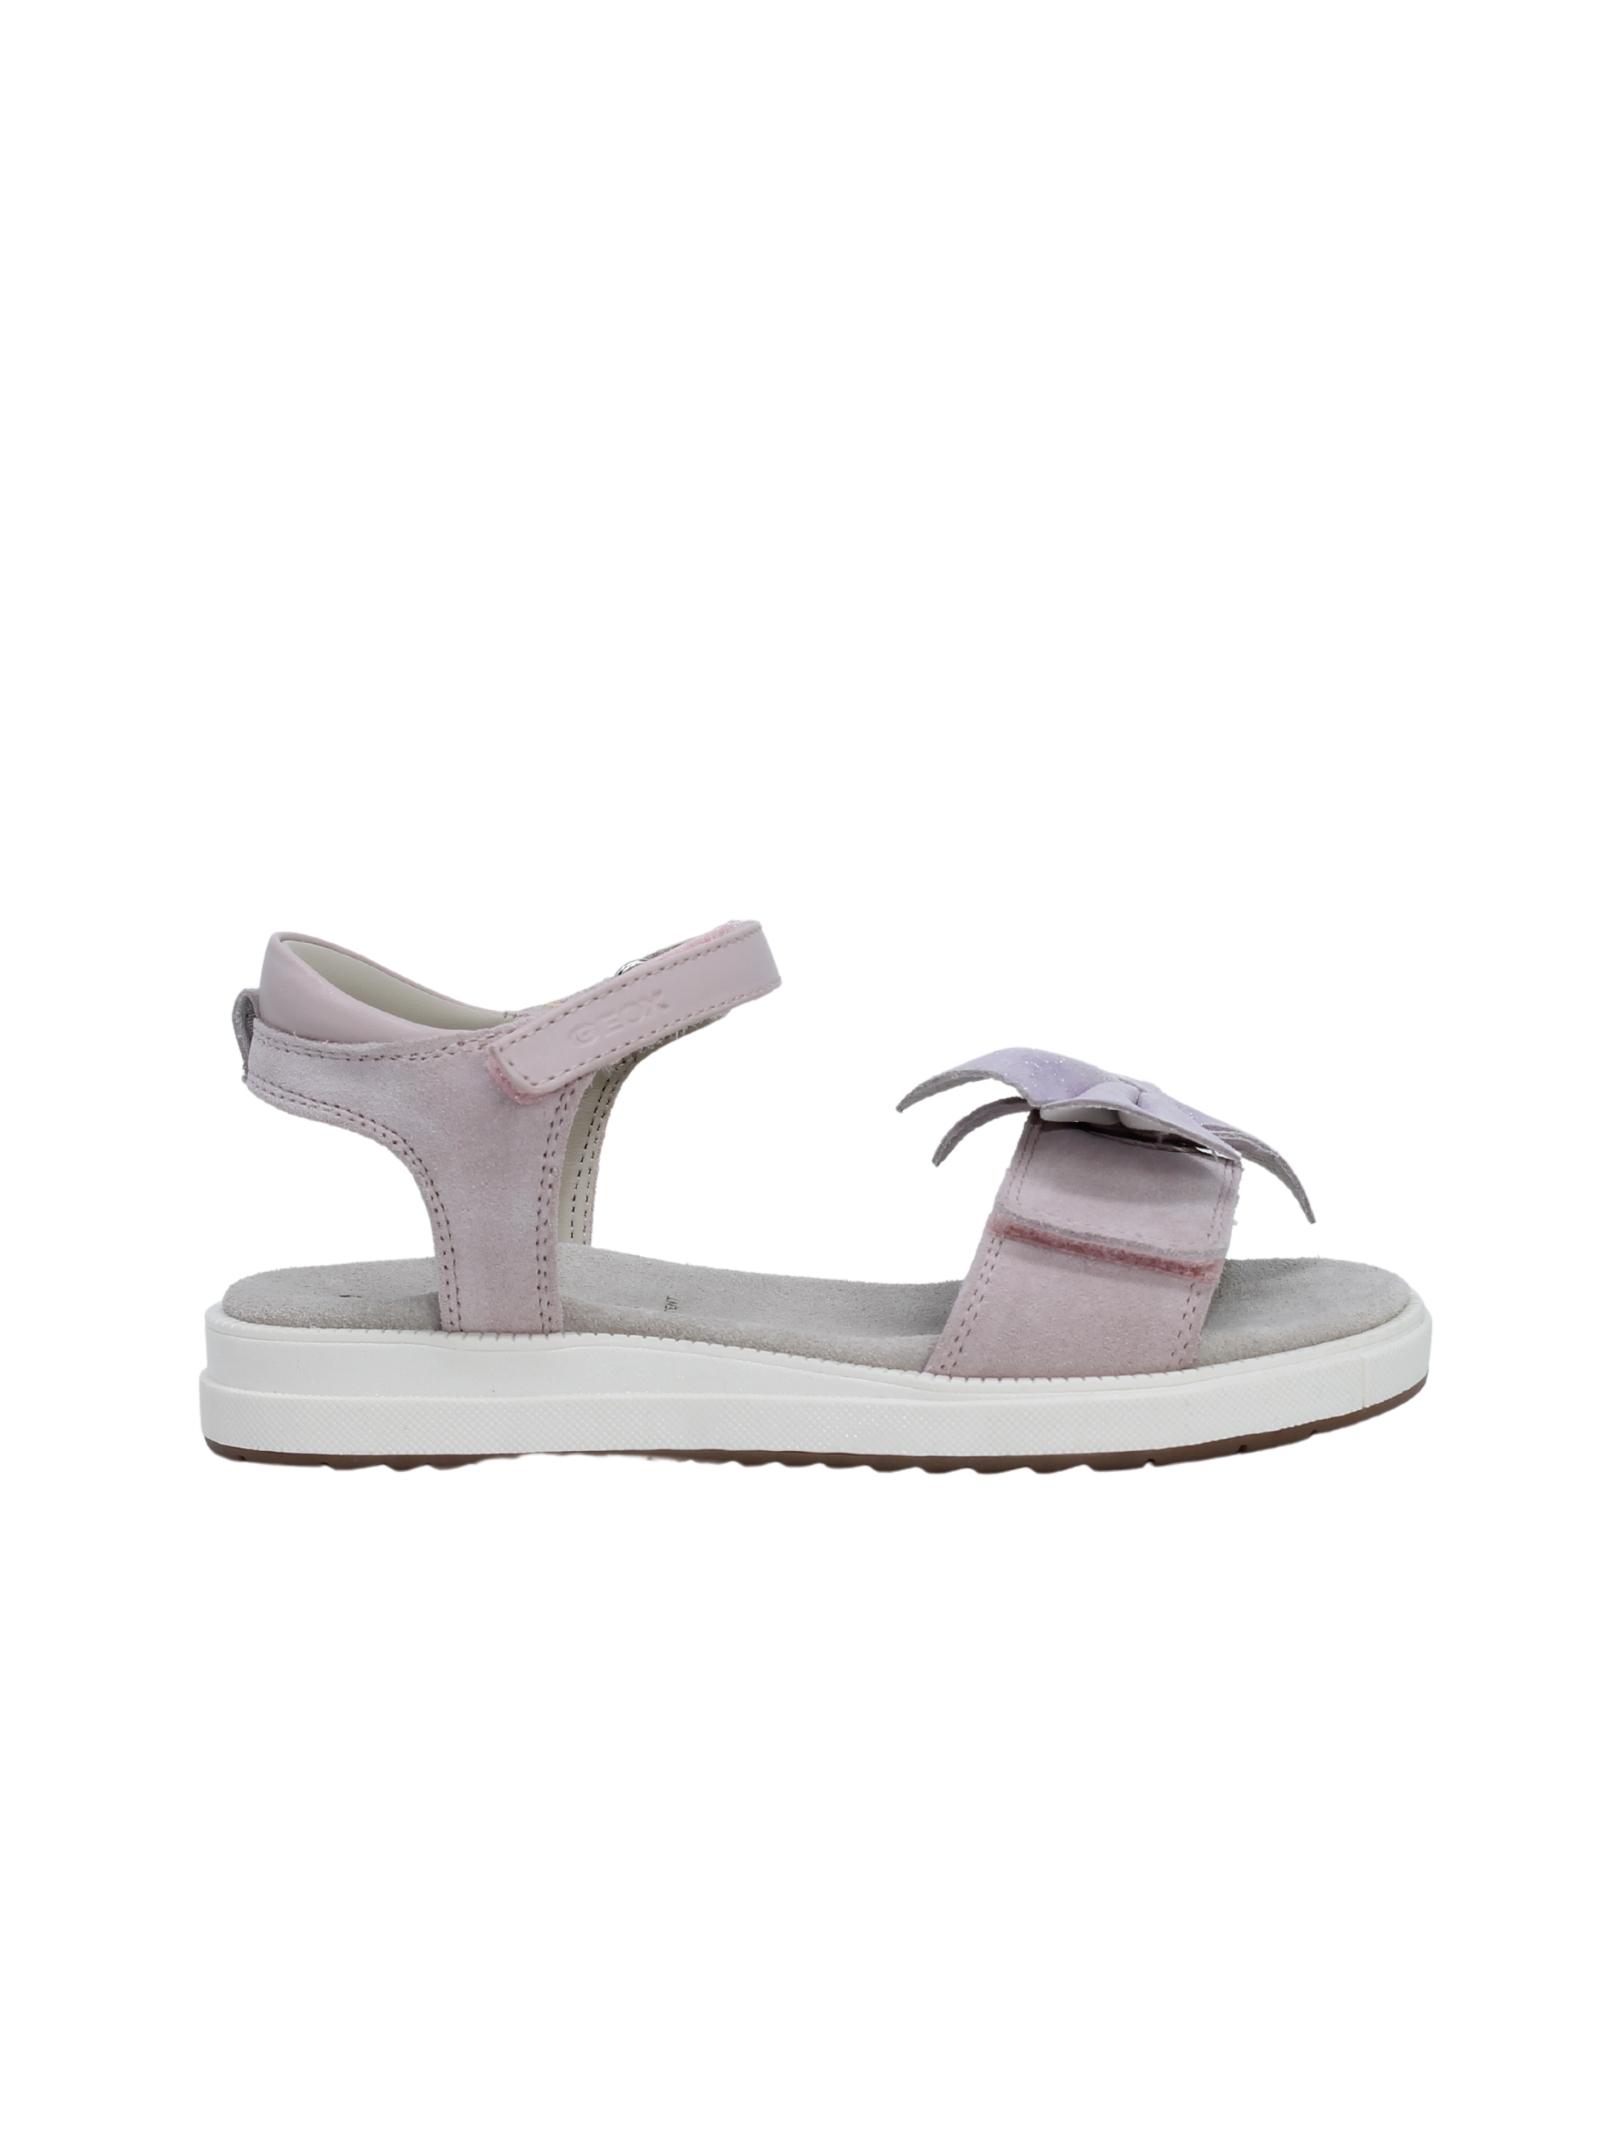 Sandalo Bambina Suede GEOX KIDS | Sandali | J15BLE022BCC8172